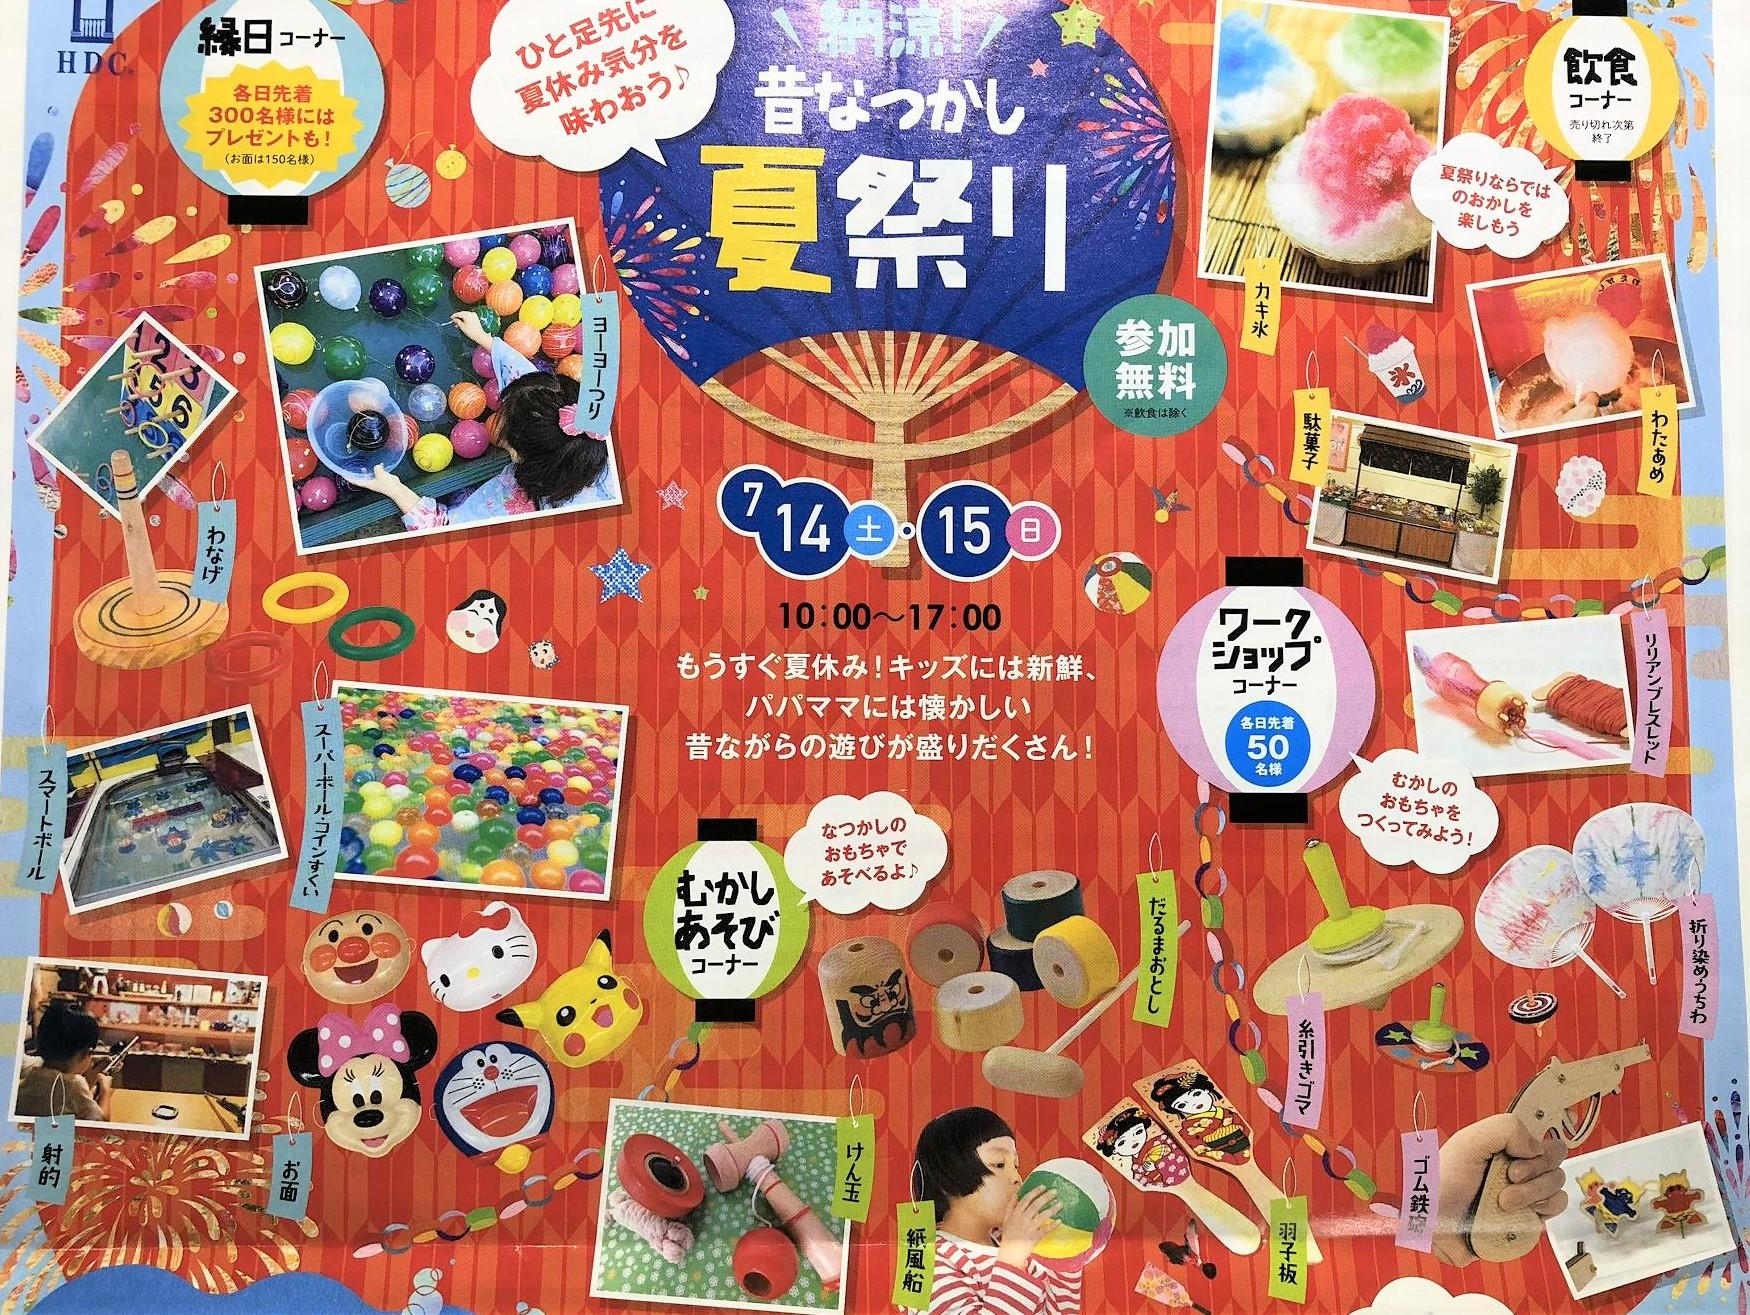 JR神戸駅南側のハウジング・デザイン・センター神戸(HDC神戸)で「納涼!昔なつかし夏祭り」が7/14(土)・15(日)に開催されるよ! #HDC神戸 #夏祭り #神戸イベント